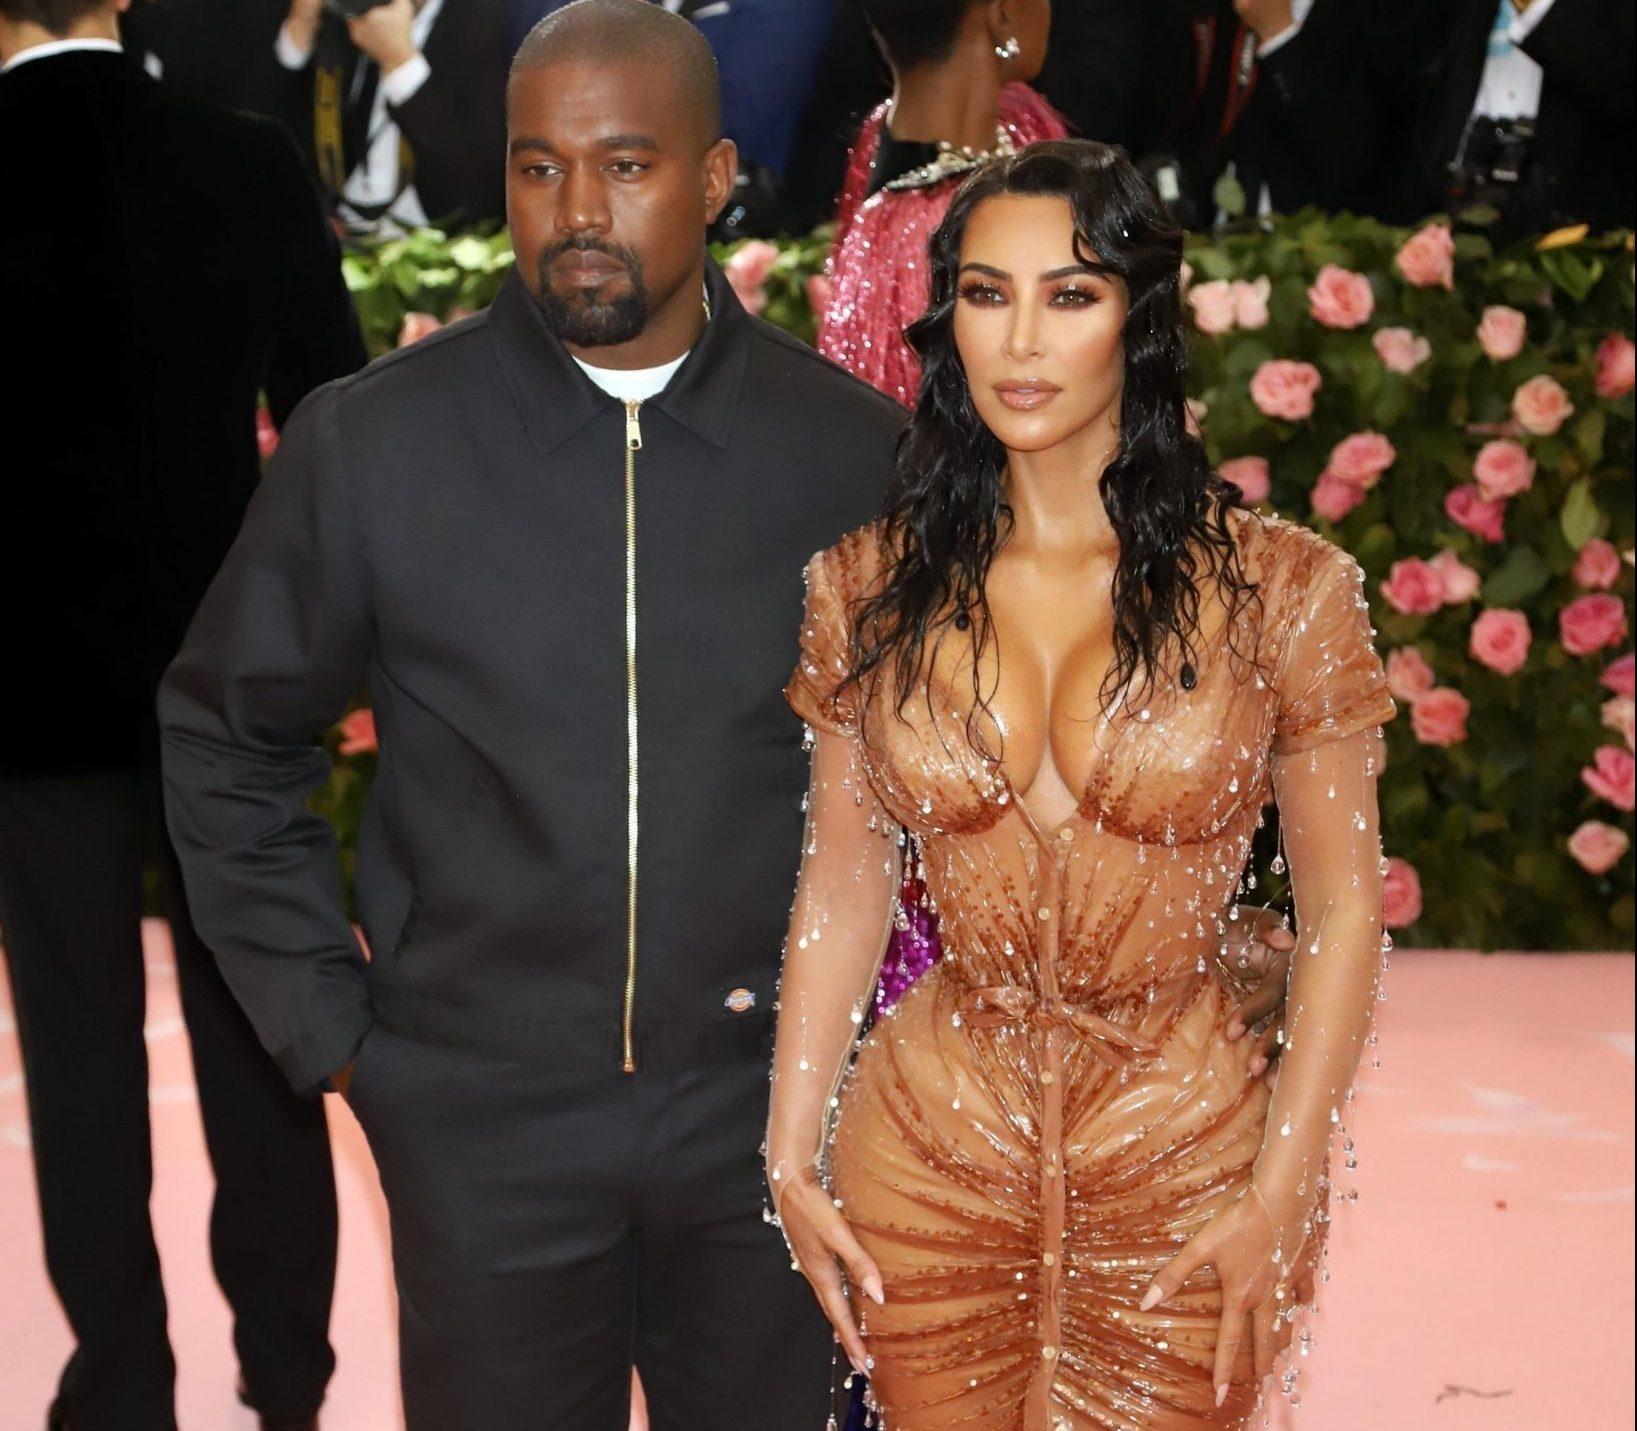 Kim Kardashian treats herself to all the doughnuts after slaying Met Gala red carpet